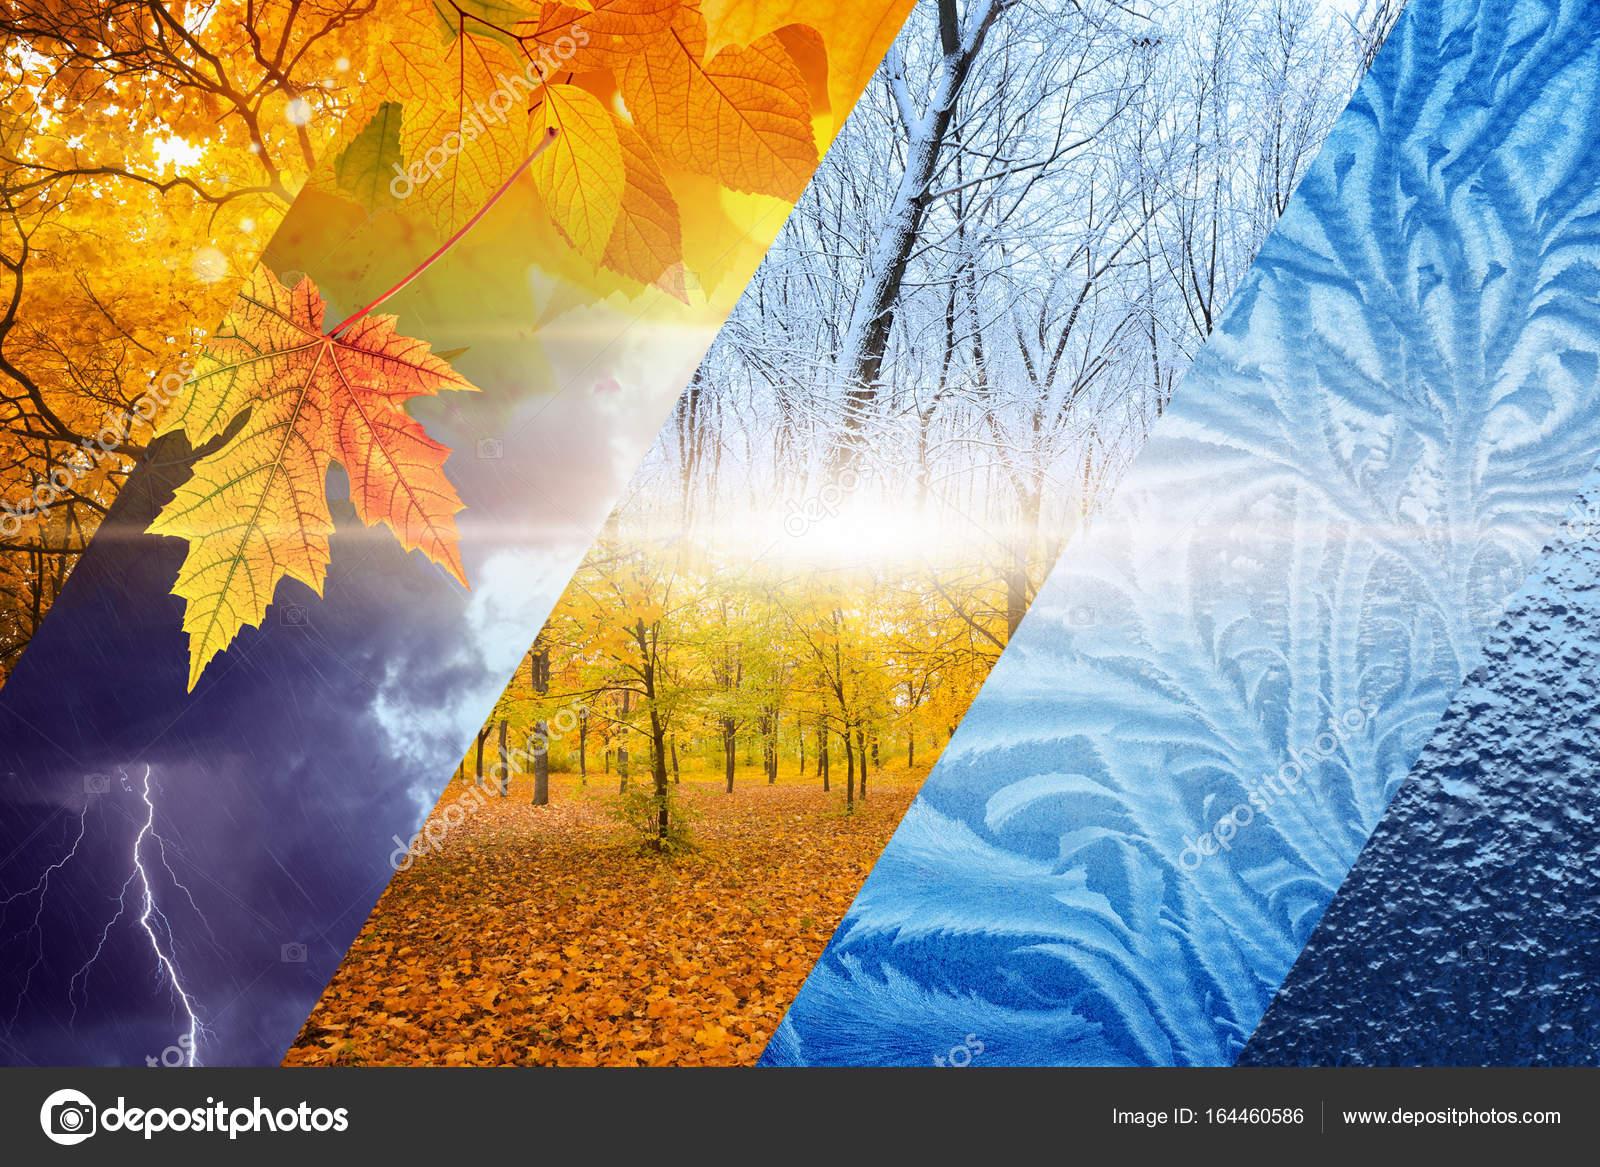 depositphotos 164460586 stock photo fall turns to winter weather